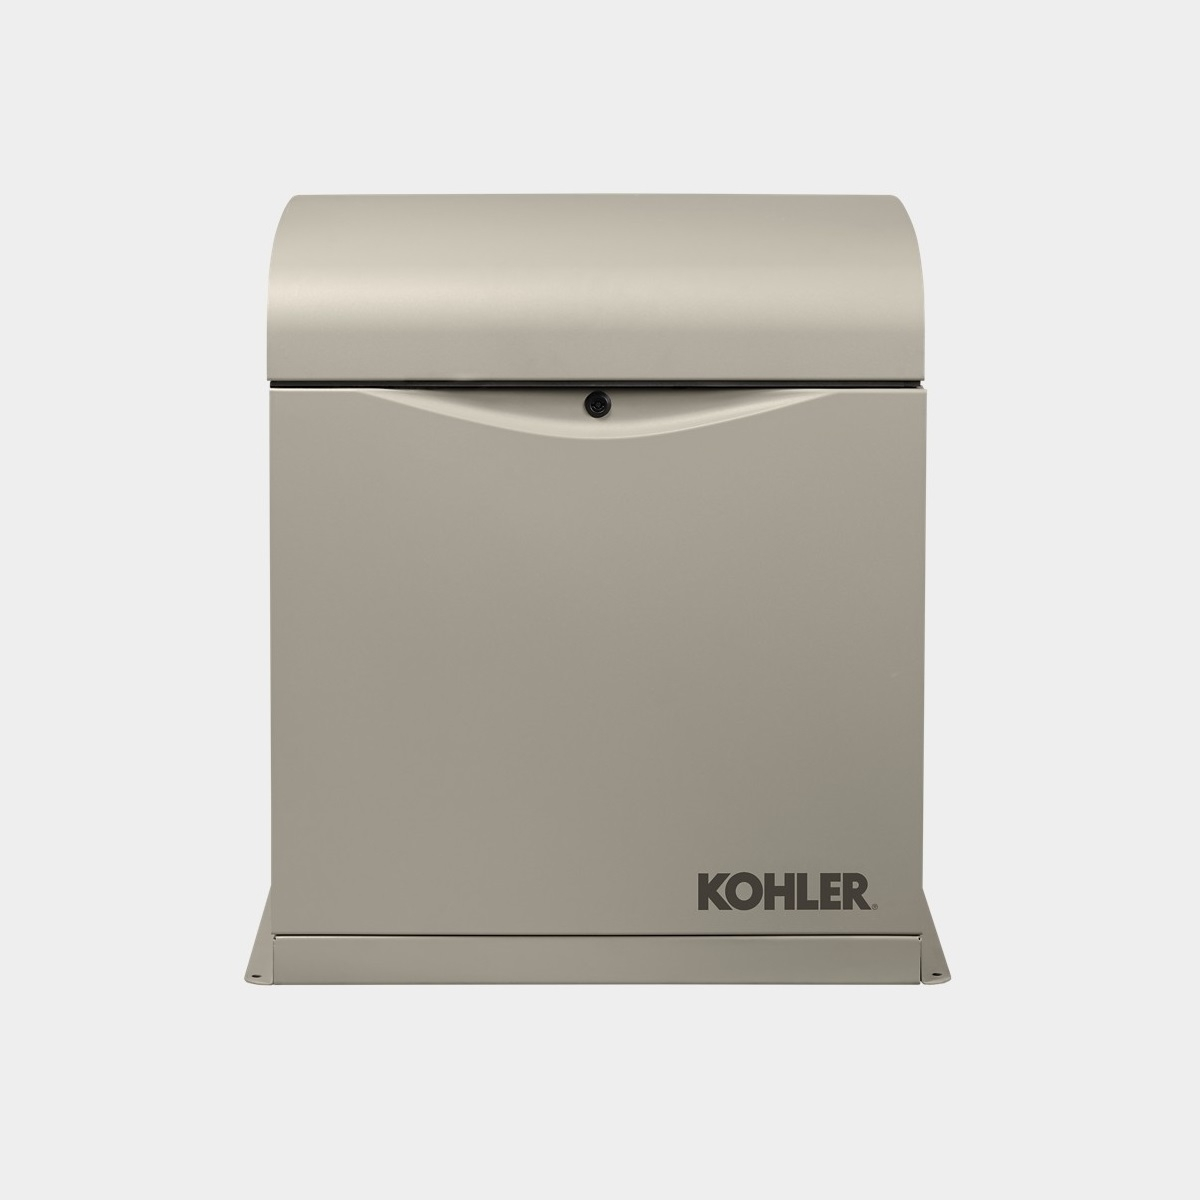 Kohler 8RESV 8 kW Generator - Single Phase, Natural Gas|LPG, with OnCue Plus